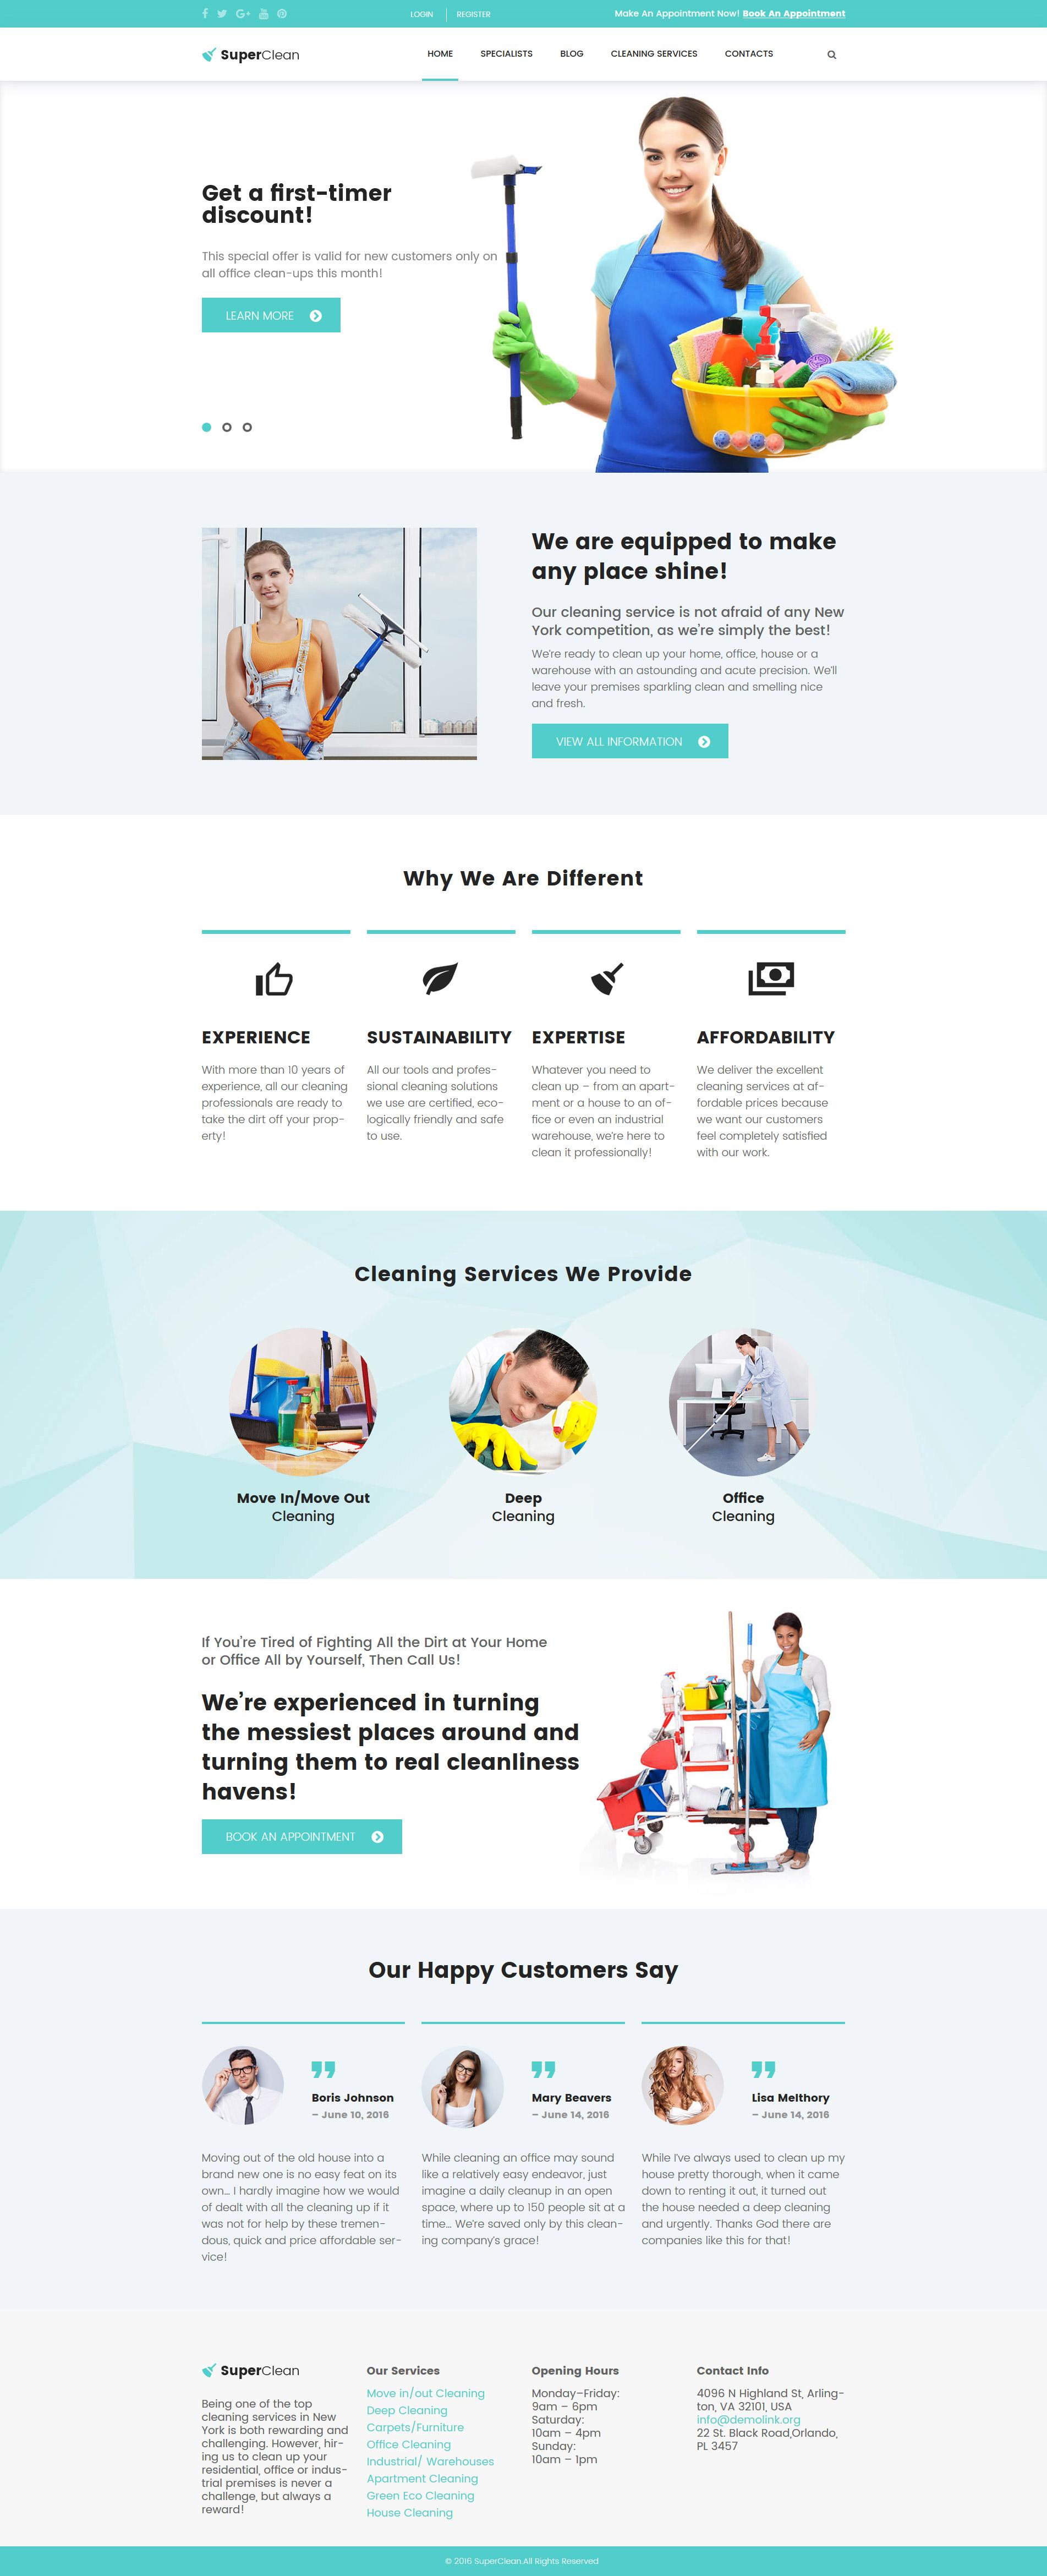 SuperClean - Cleaning & Maintenance Service WordPress Theme